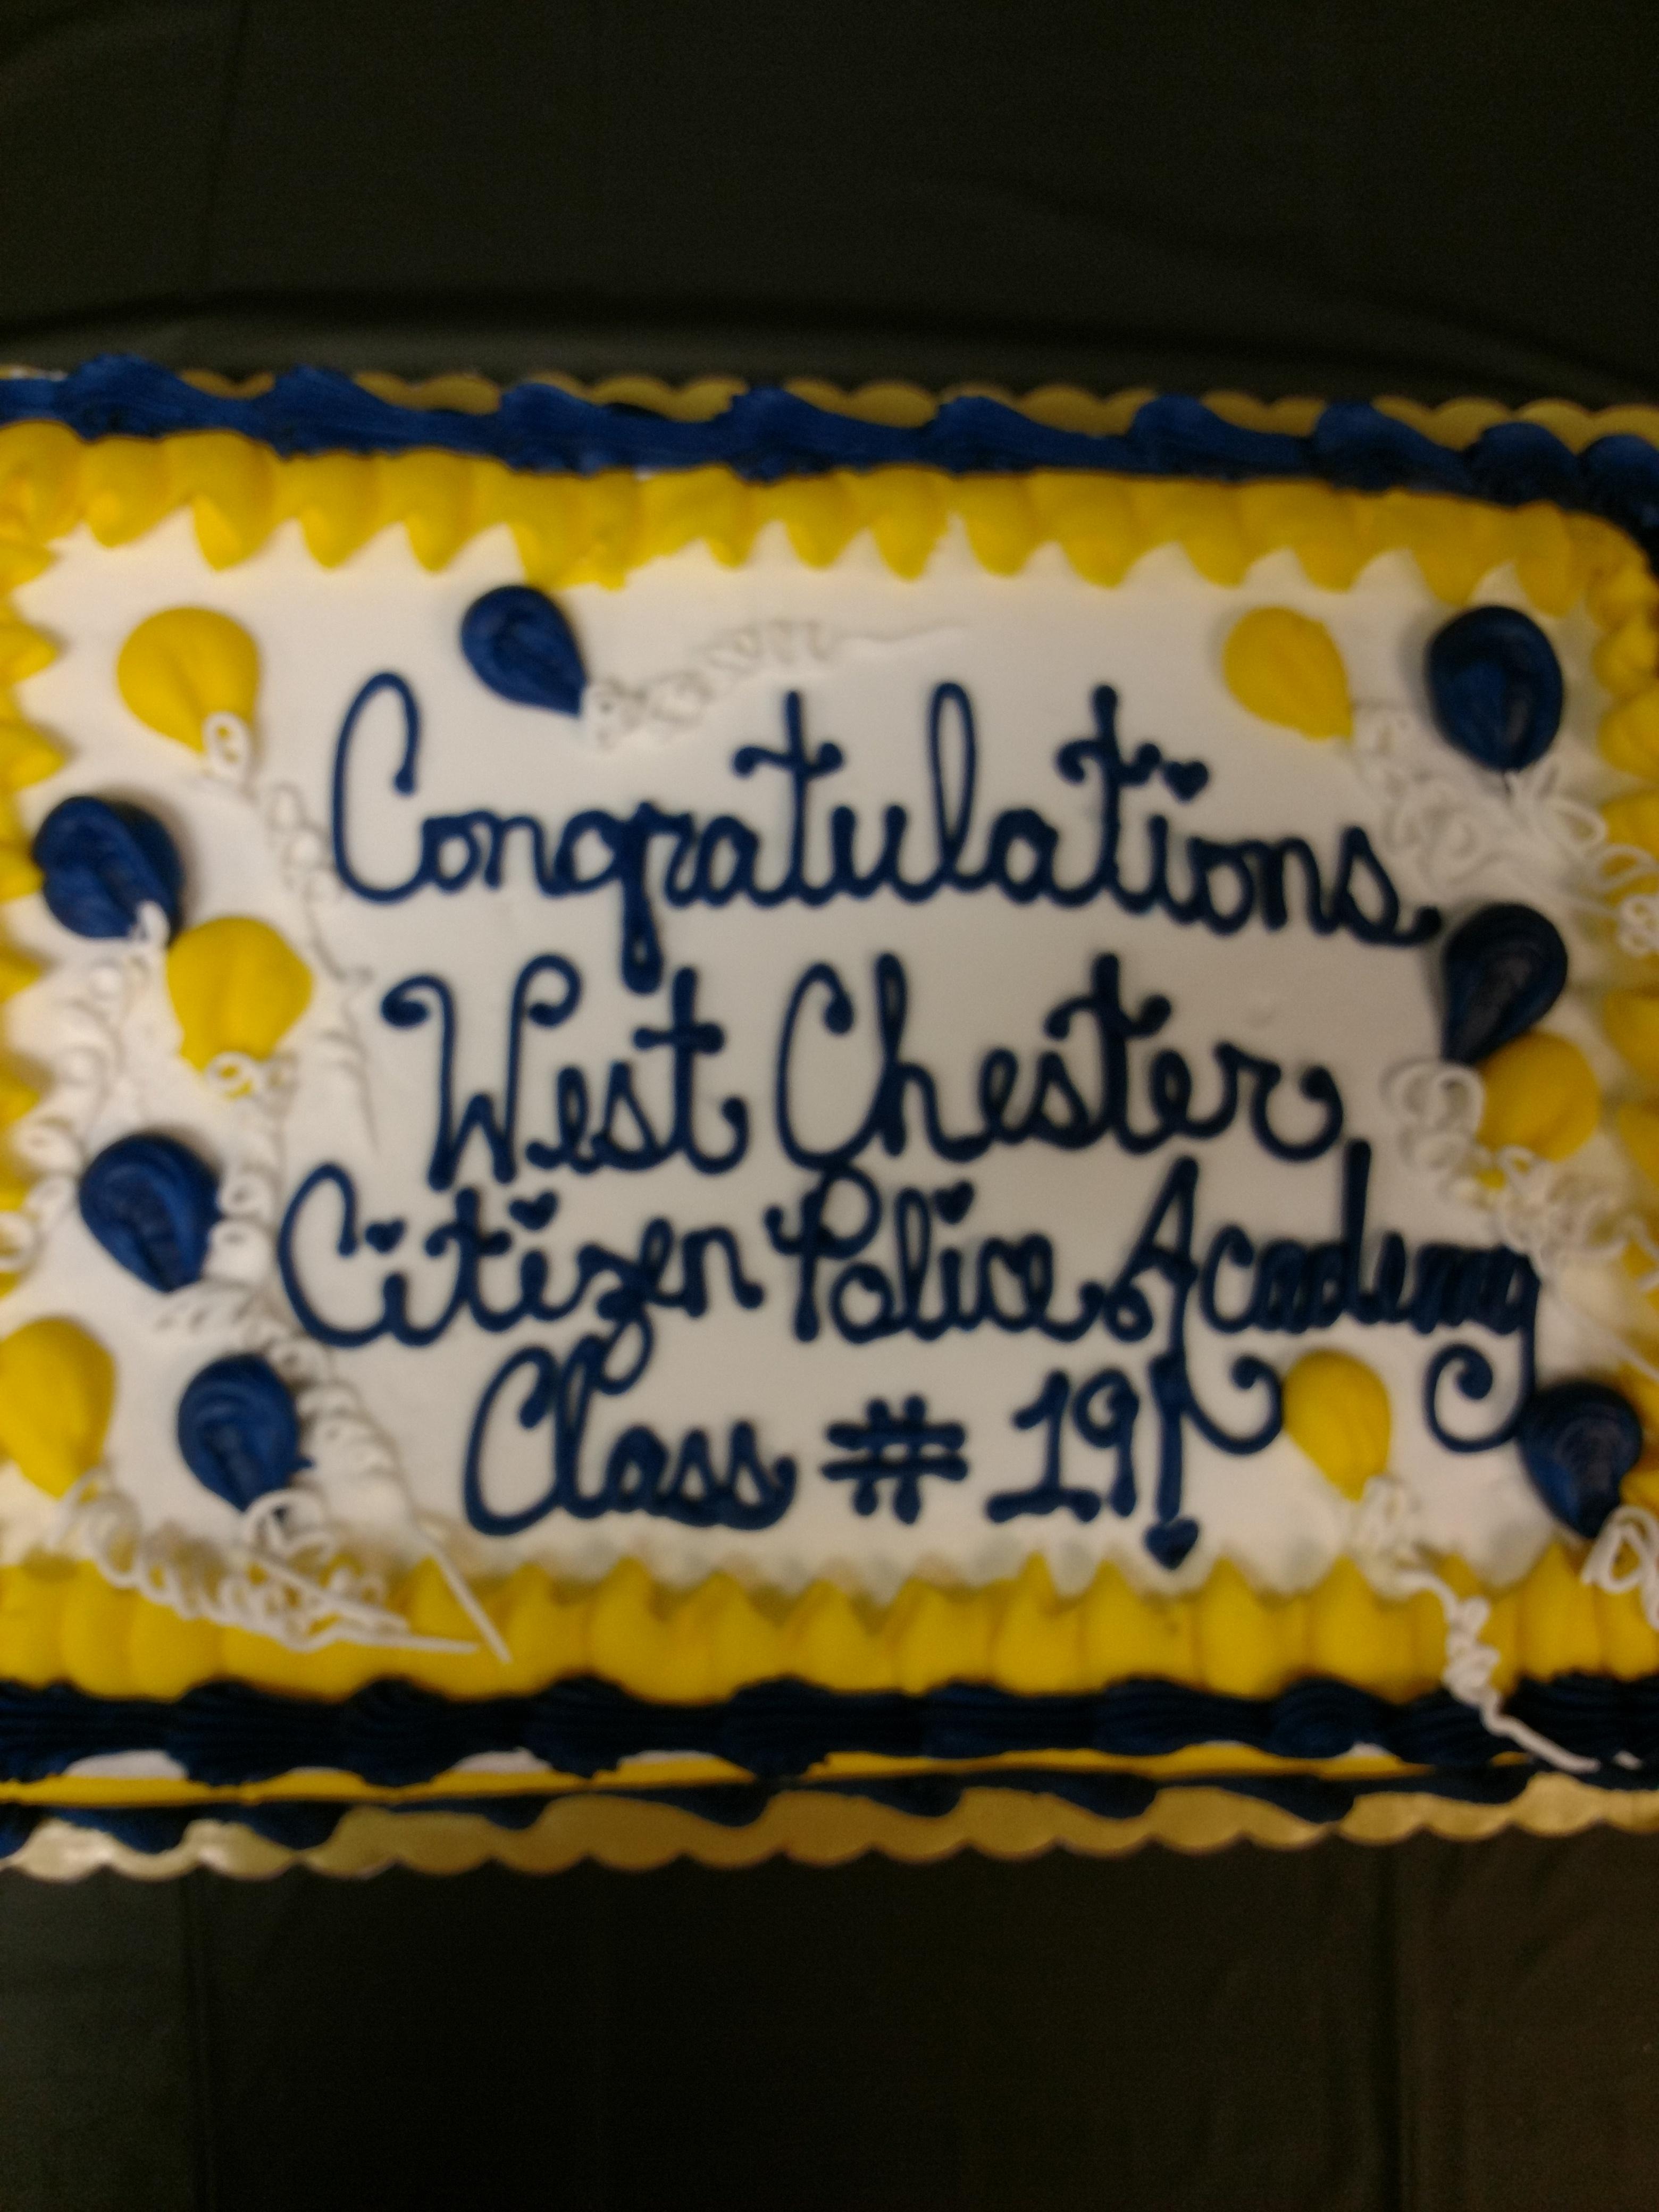 Class 19 graduation